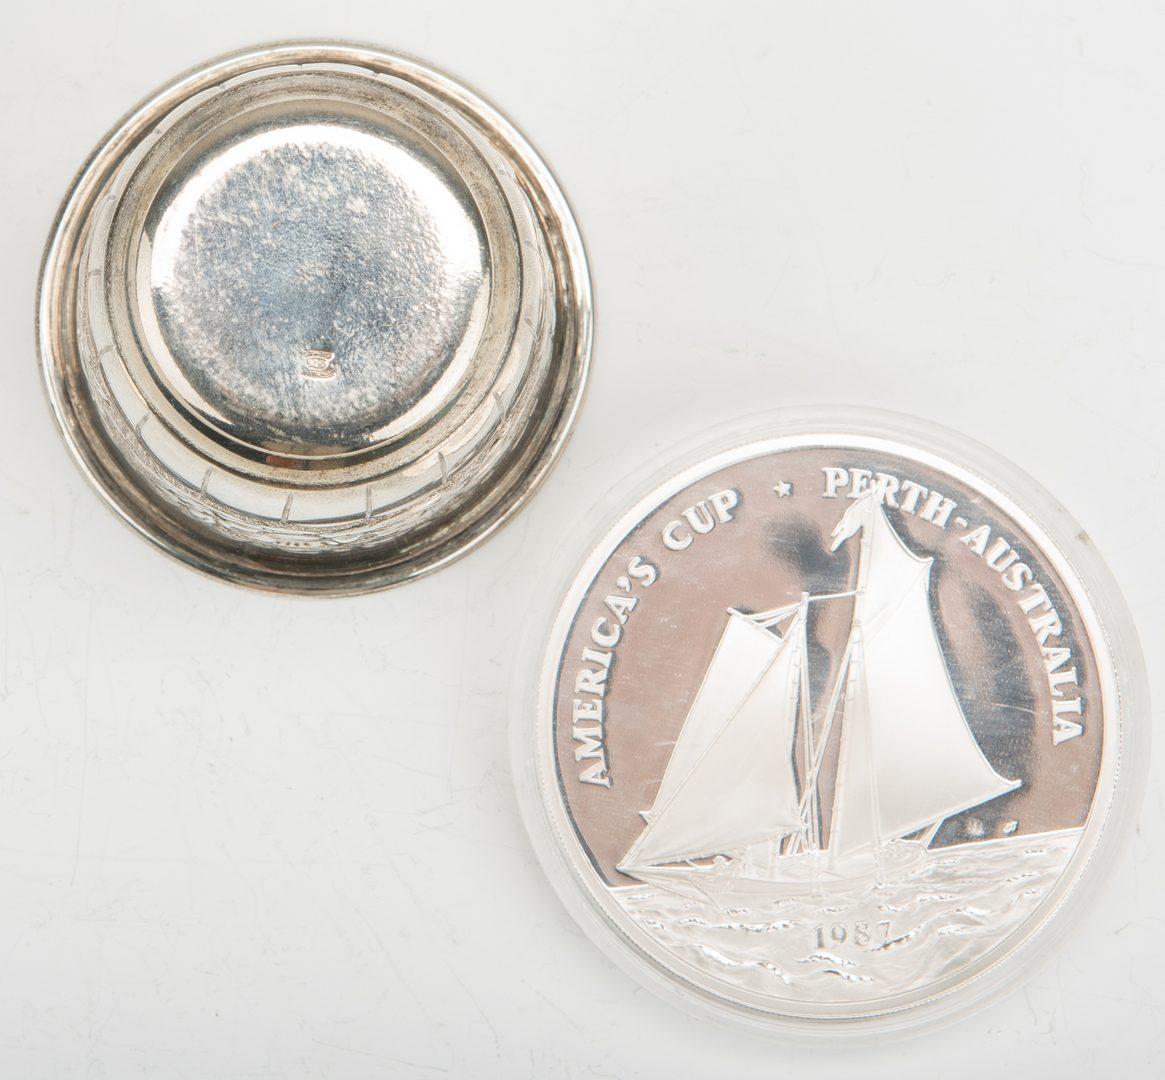 Lot 777: 40 pcs assd. Flatware, plus jigger & coin (42 items total)